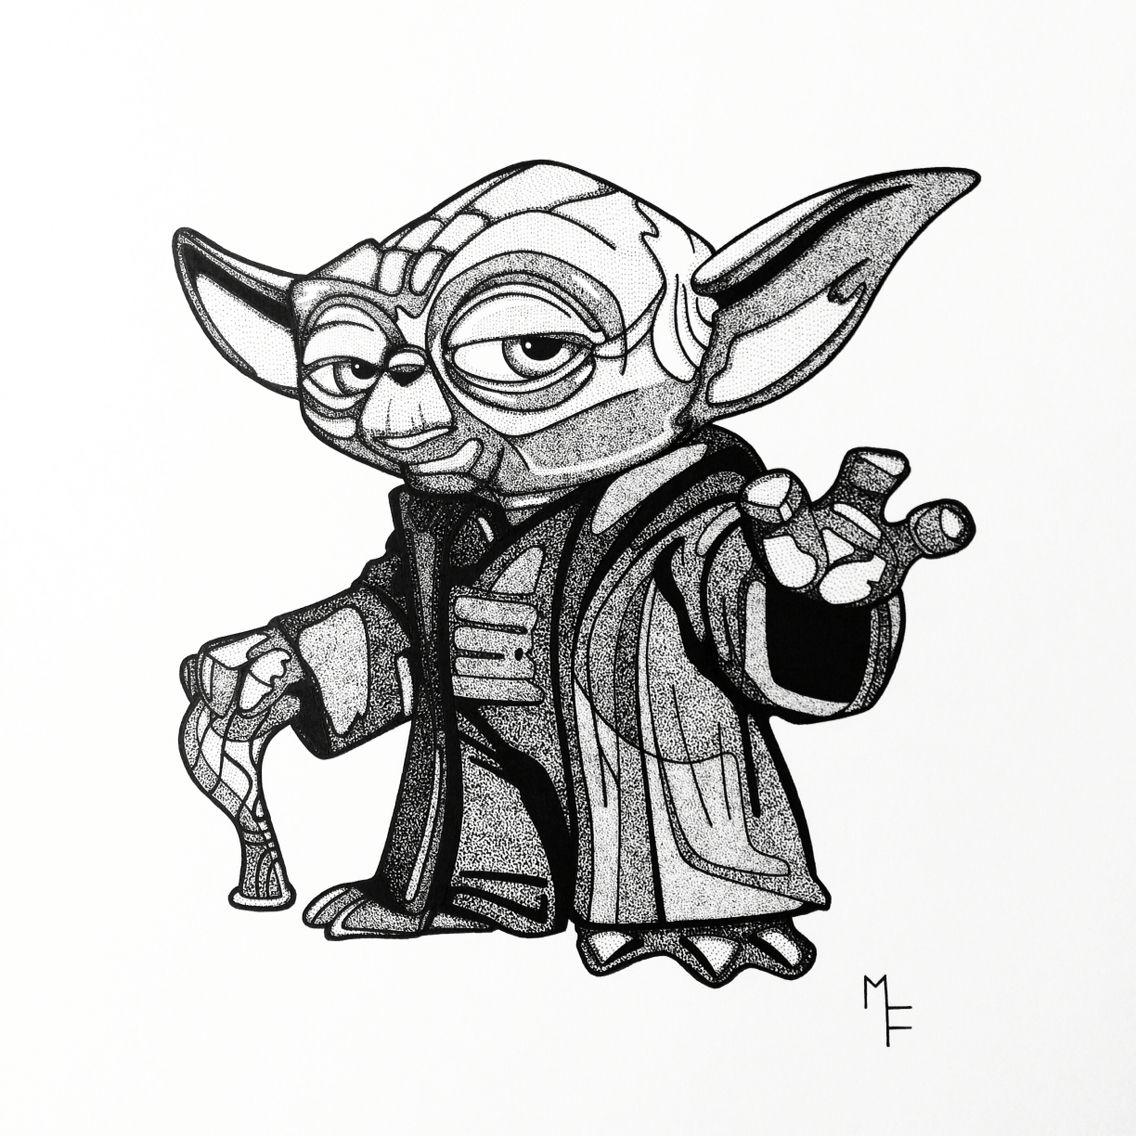 Master Yoda Handmade Illustration For Christmas Commission